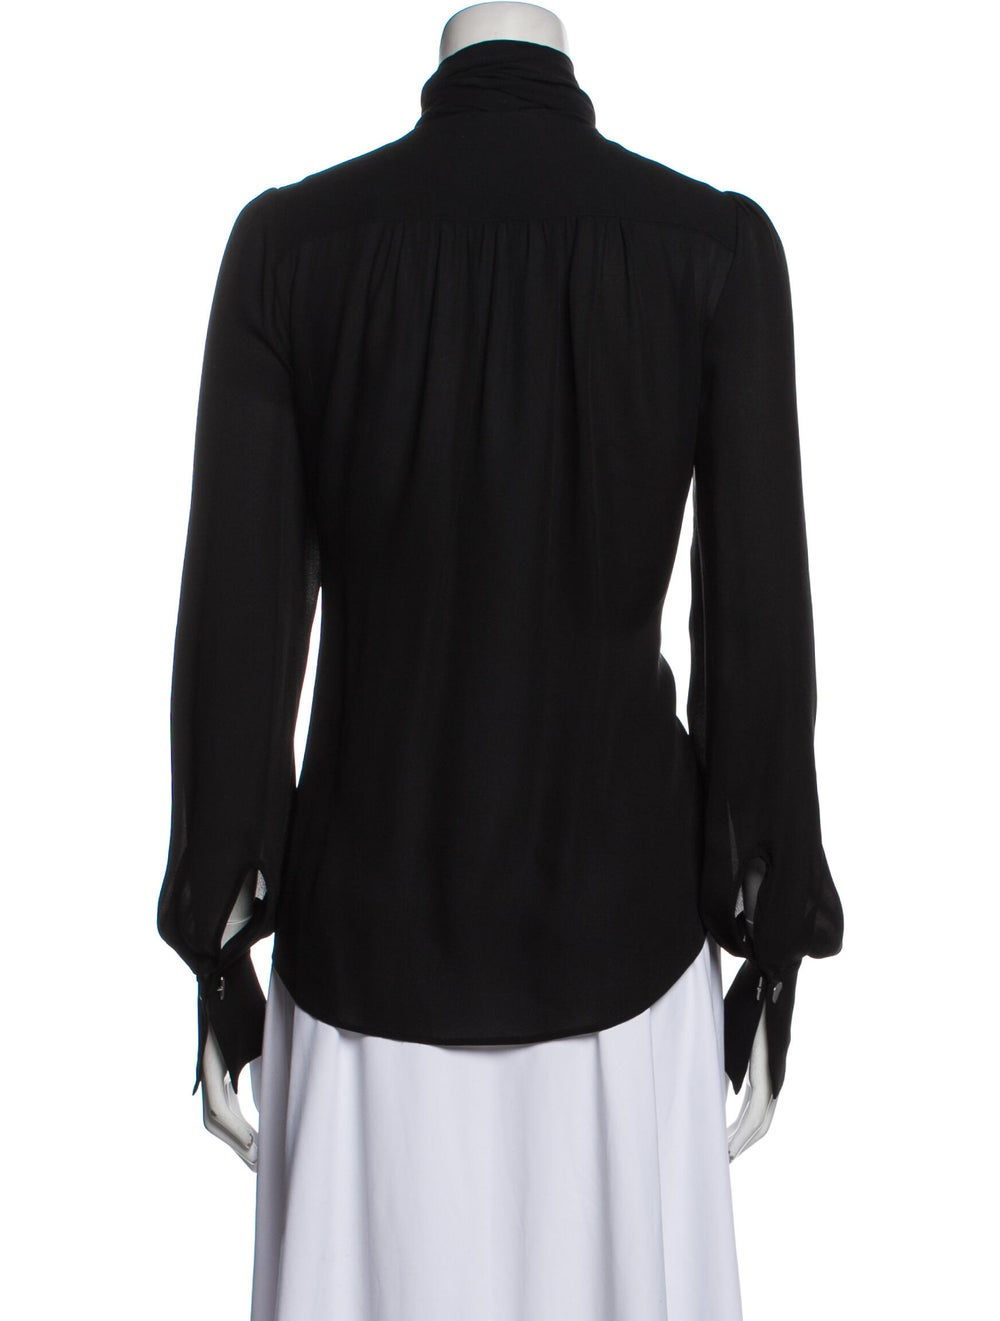 Plein Sud Silk Mock Neck Blouse Black - image 3